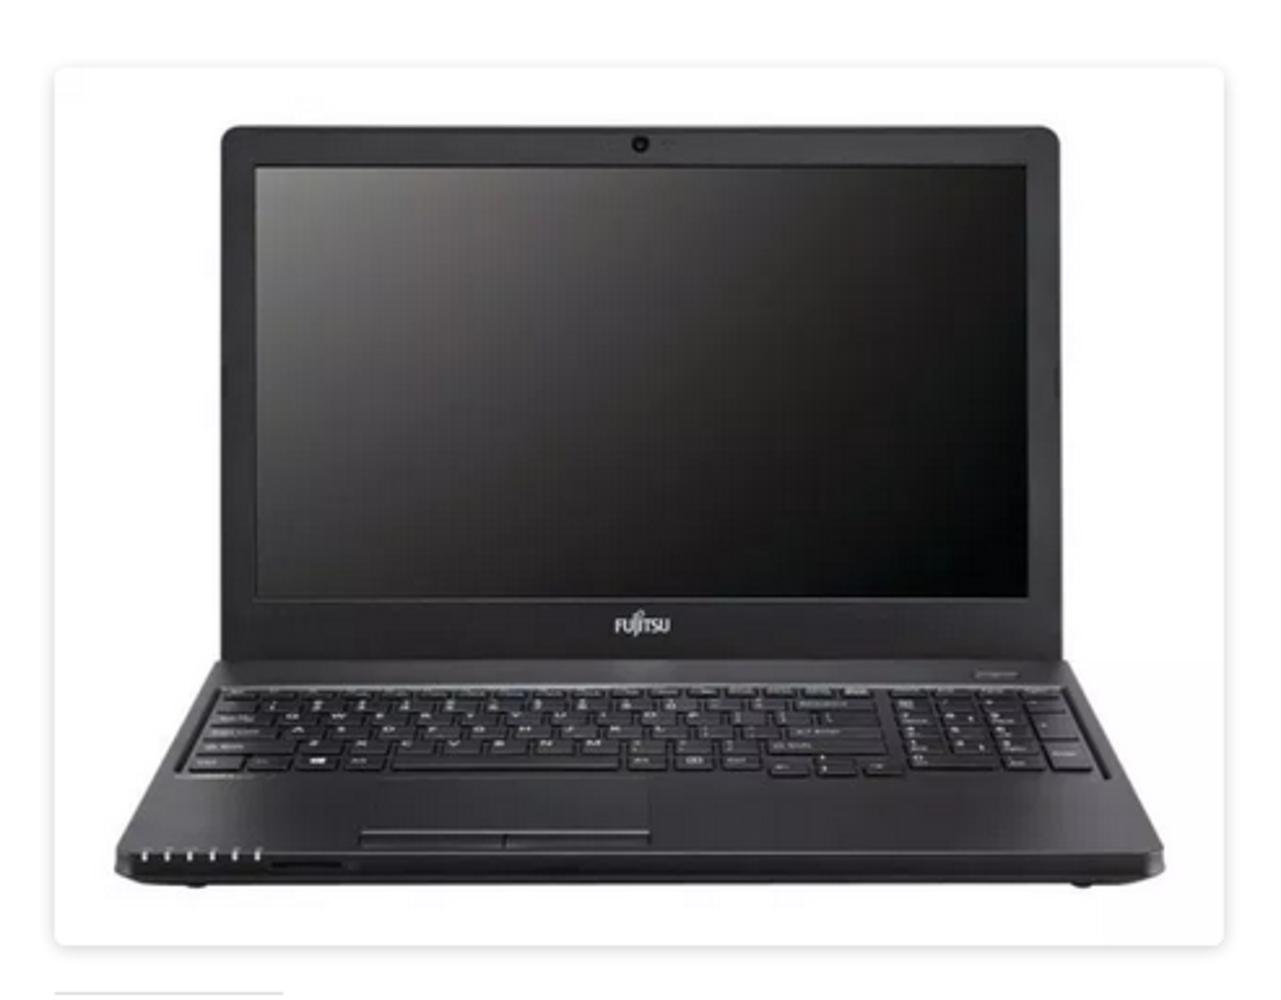 PC portable I3 FUJITSU à prix doux 0